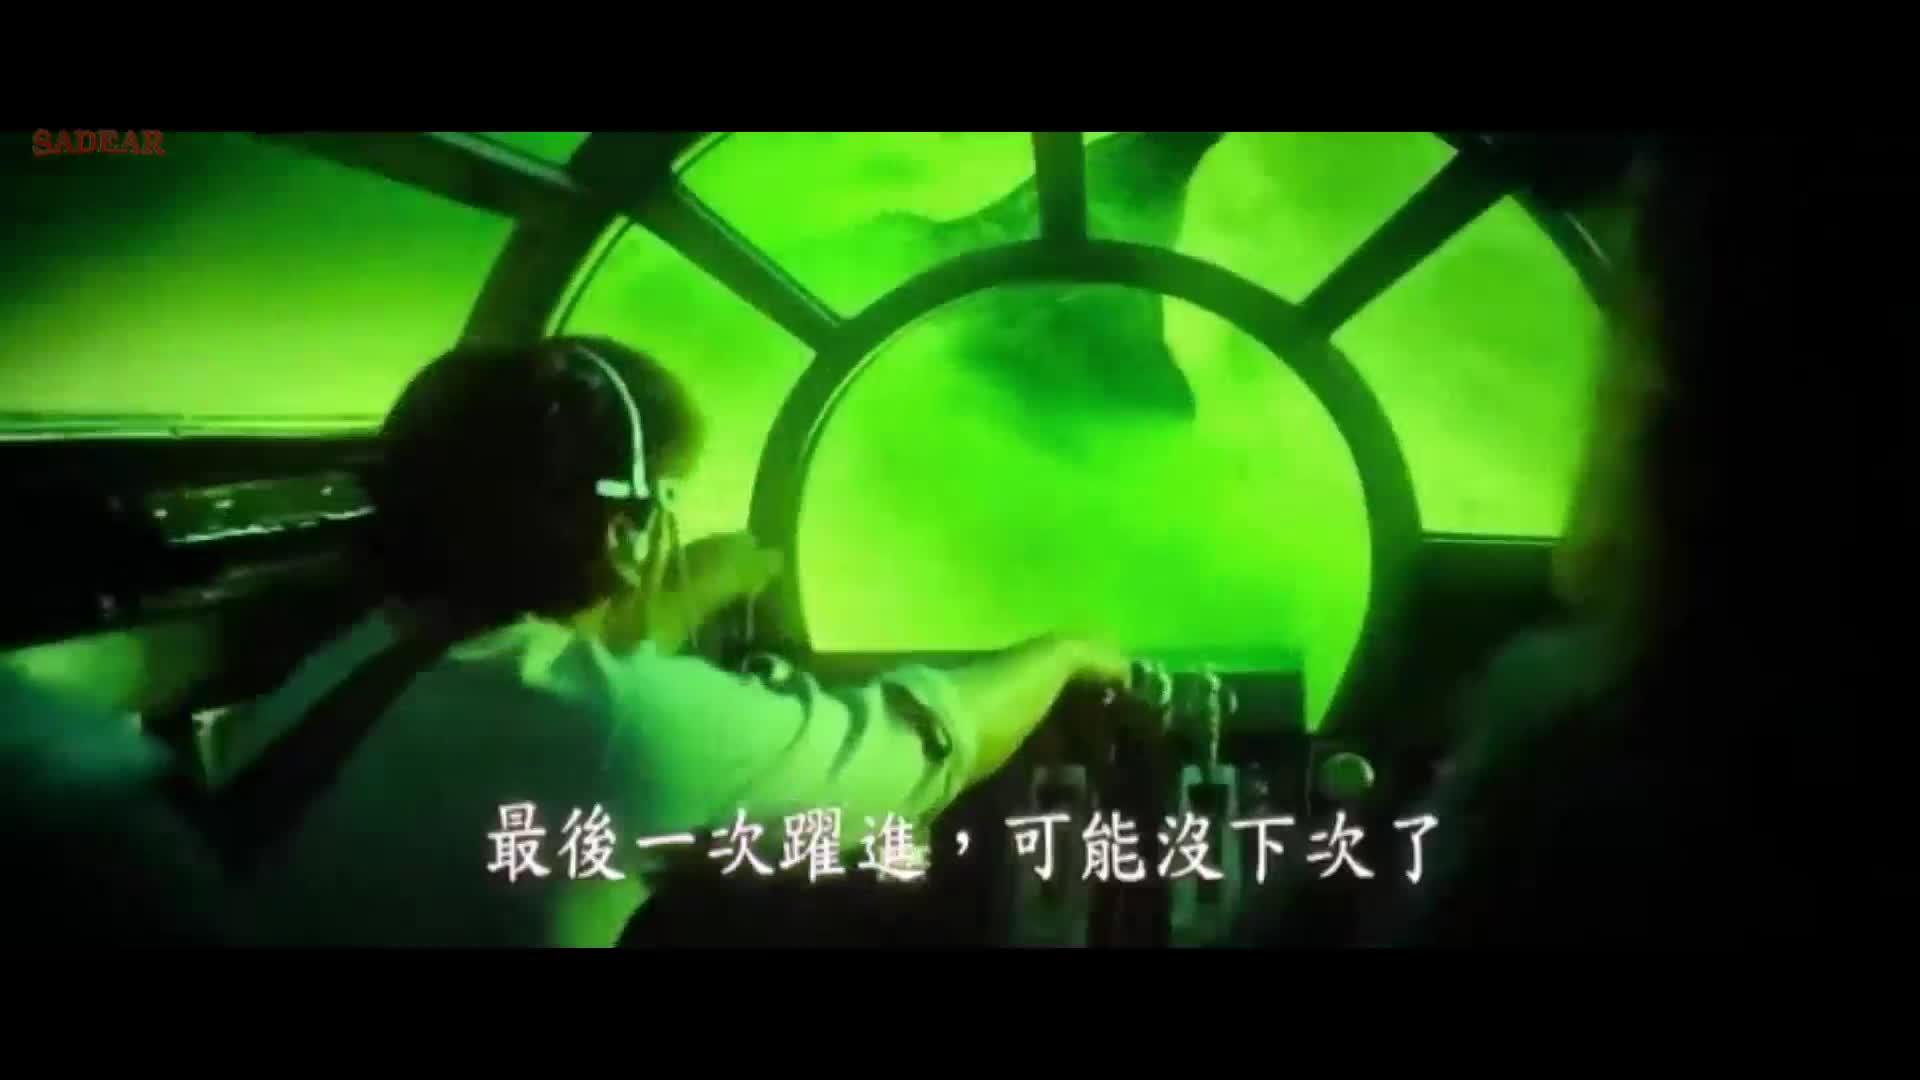 Star Wars Episode IX The Rise of Skywalker สตาร์ วอร์ส กำเนิดใหม่สกายวอล์คเกอร์ 2019 Zoom ชัดมากๆ